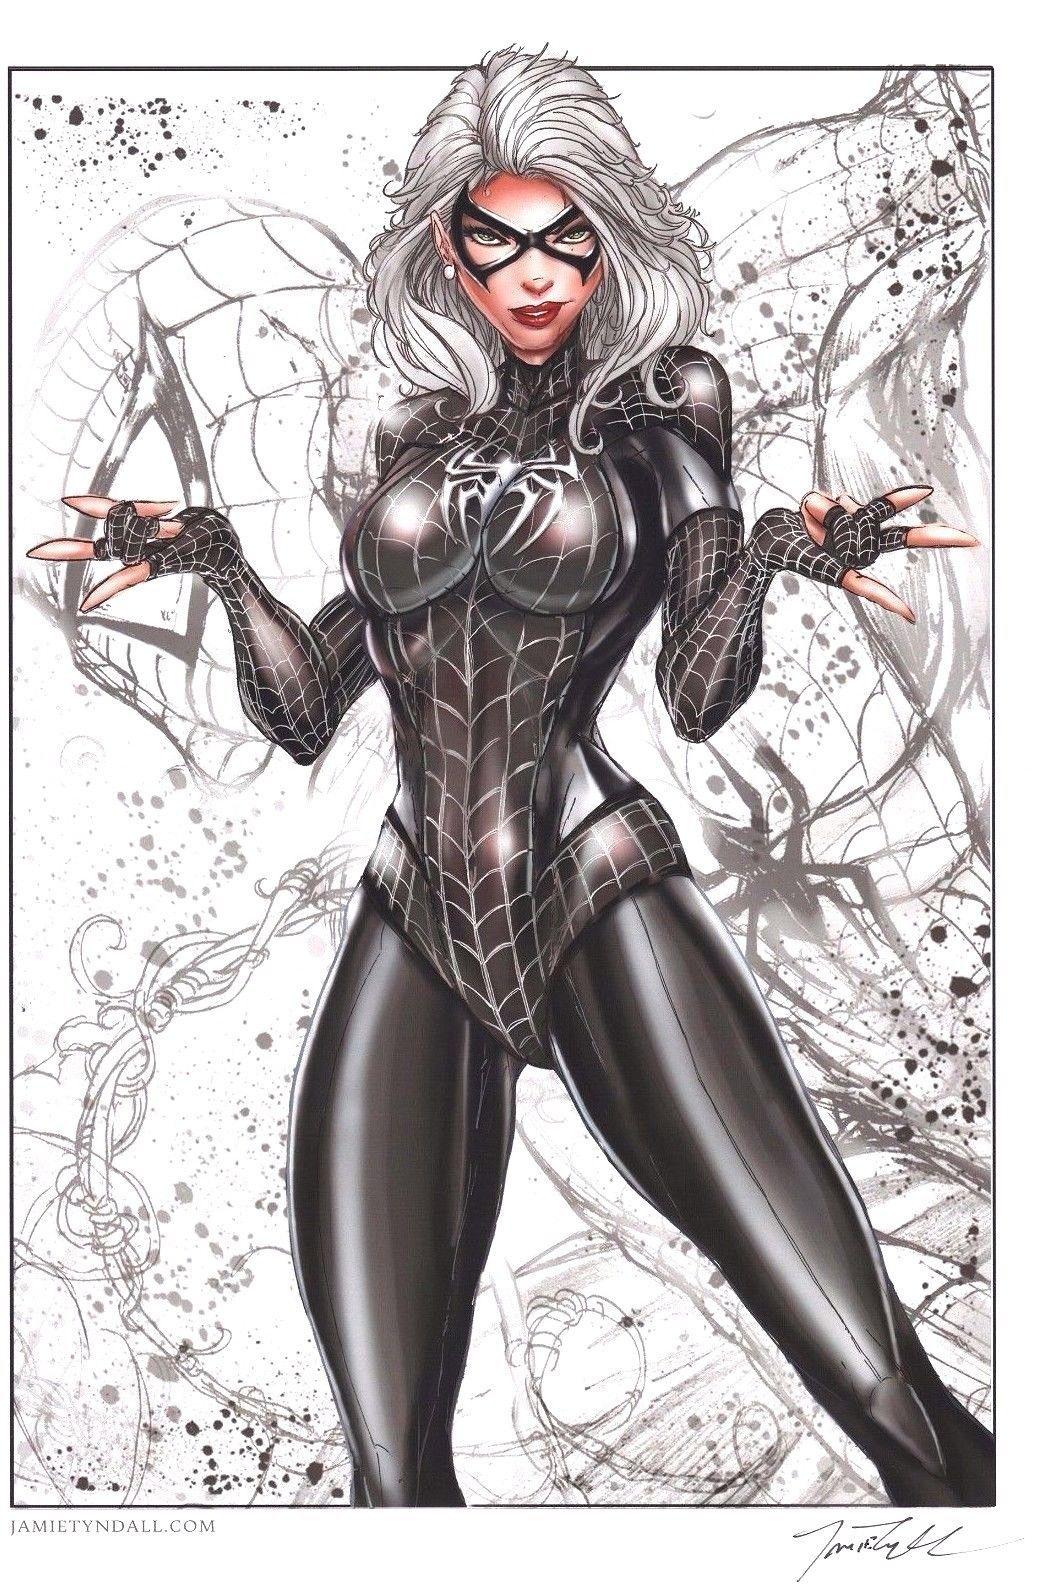 Black Cat Spider Man Suit 11x17 Signed Sketch Art Print By Jamie